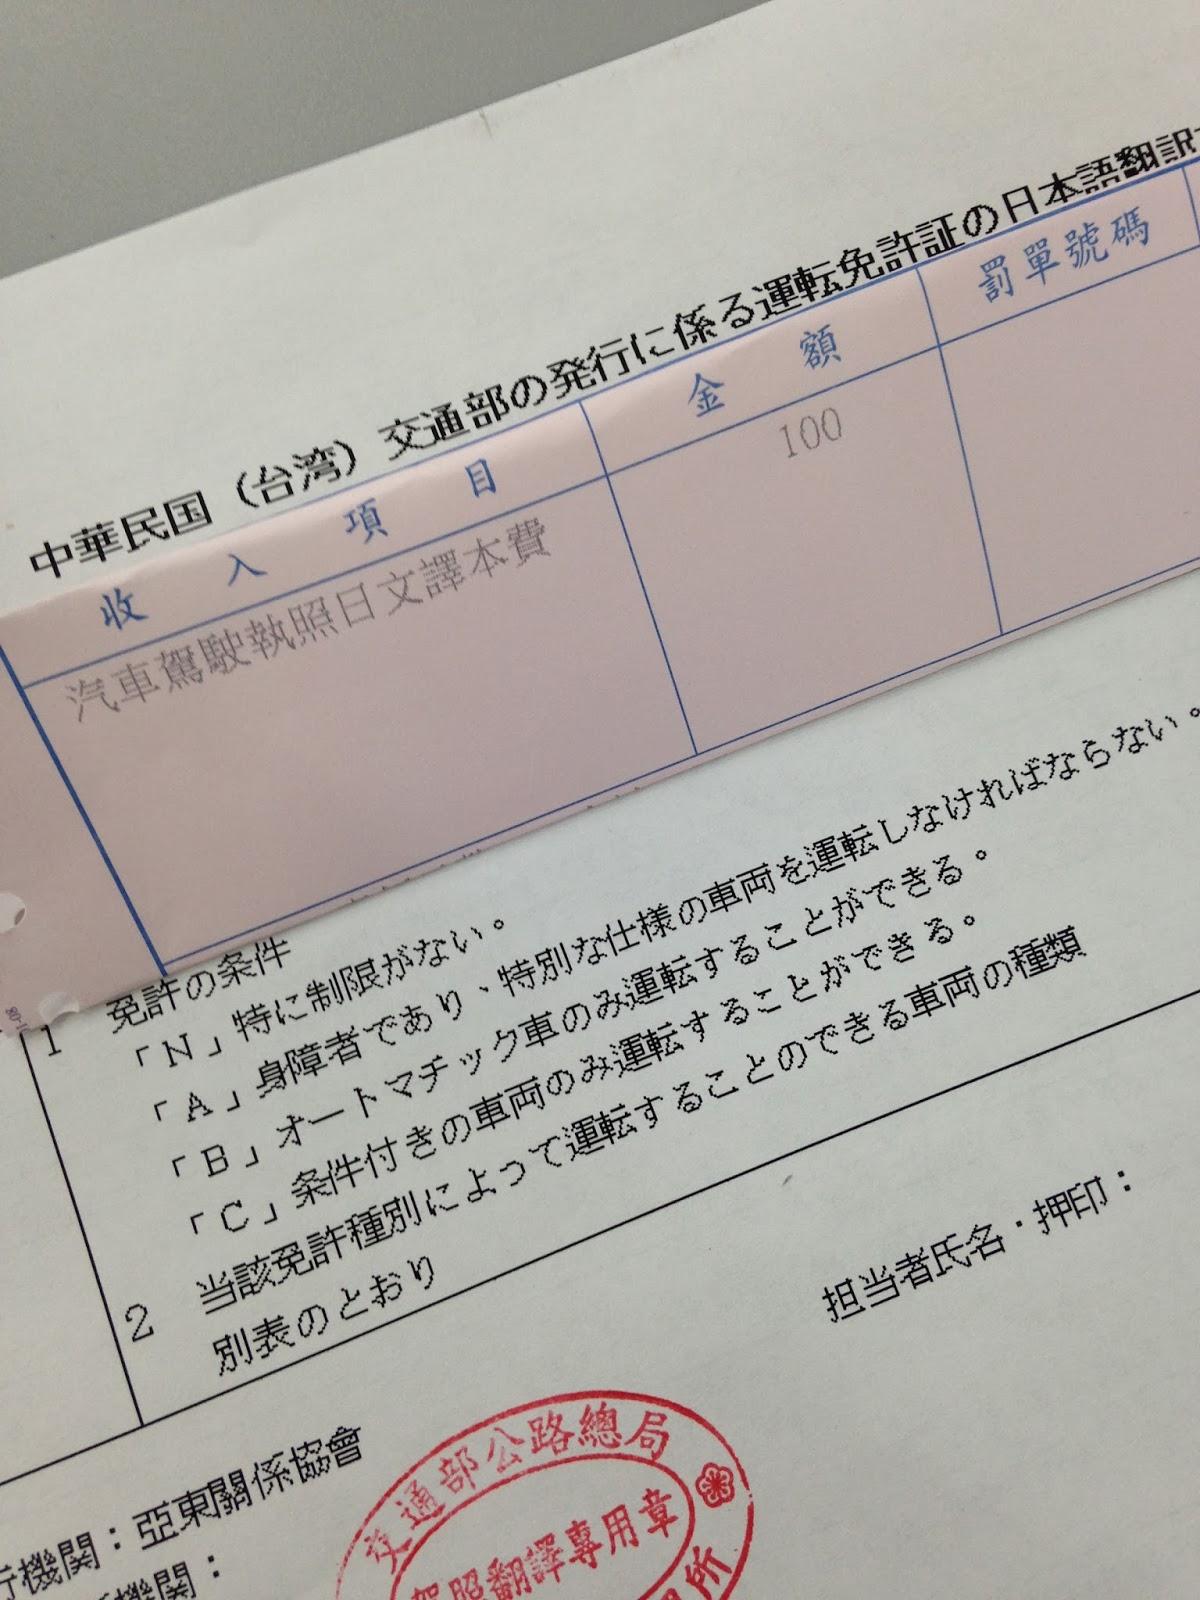 MoVe on 旅食: [沖繩]日本租車自駕初體驗,駕照日文譯本申請經驗分享~